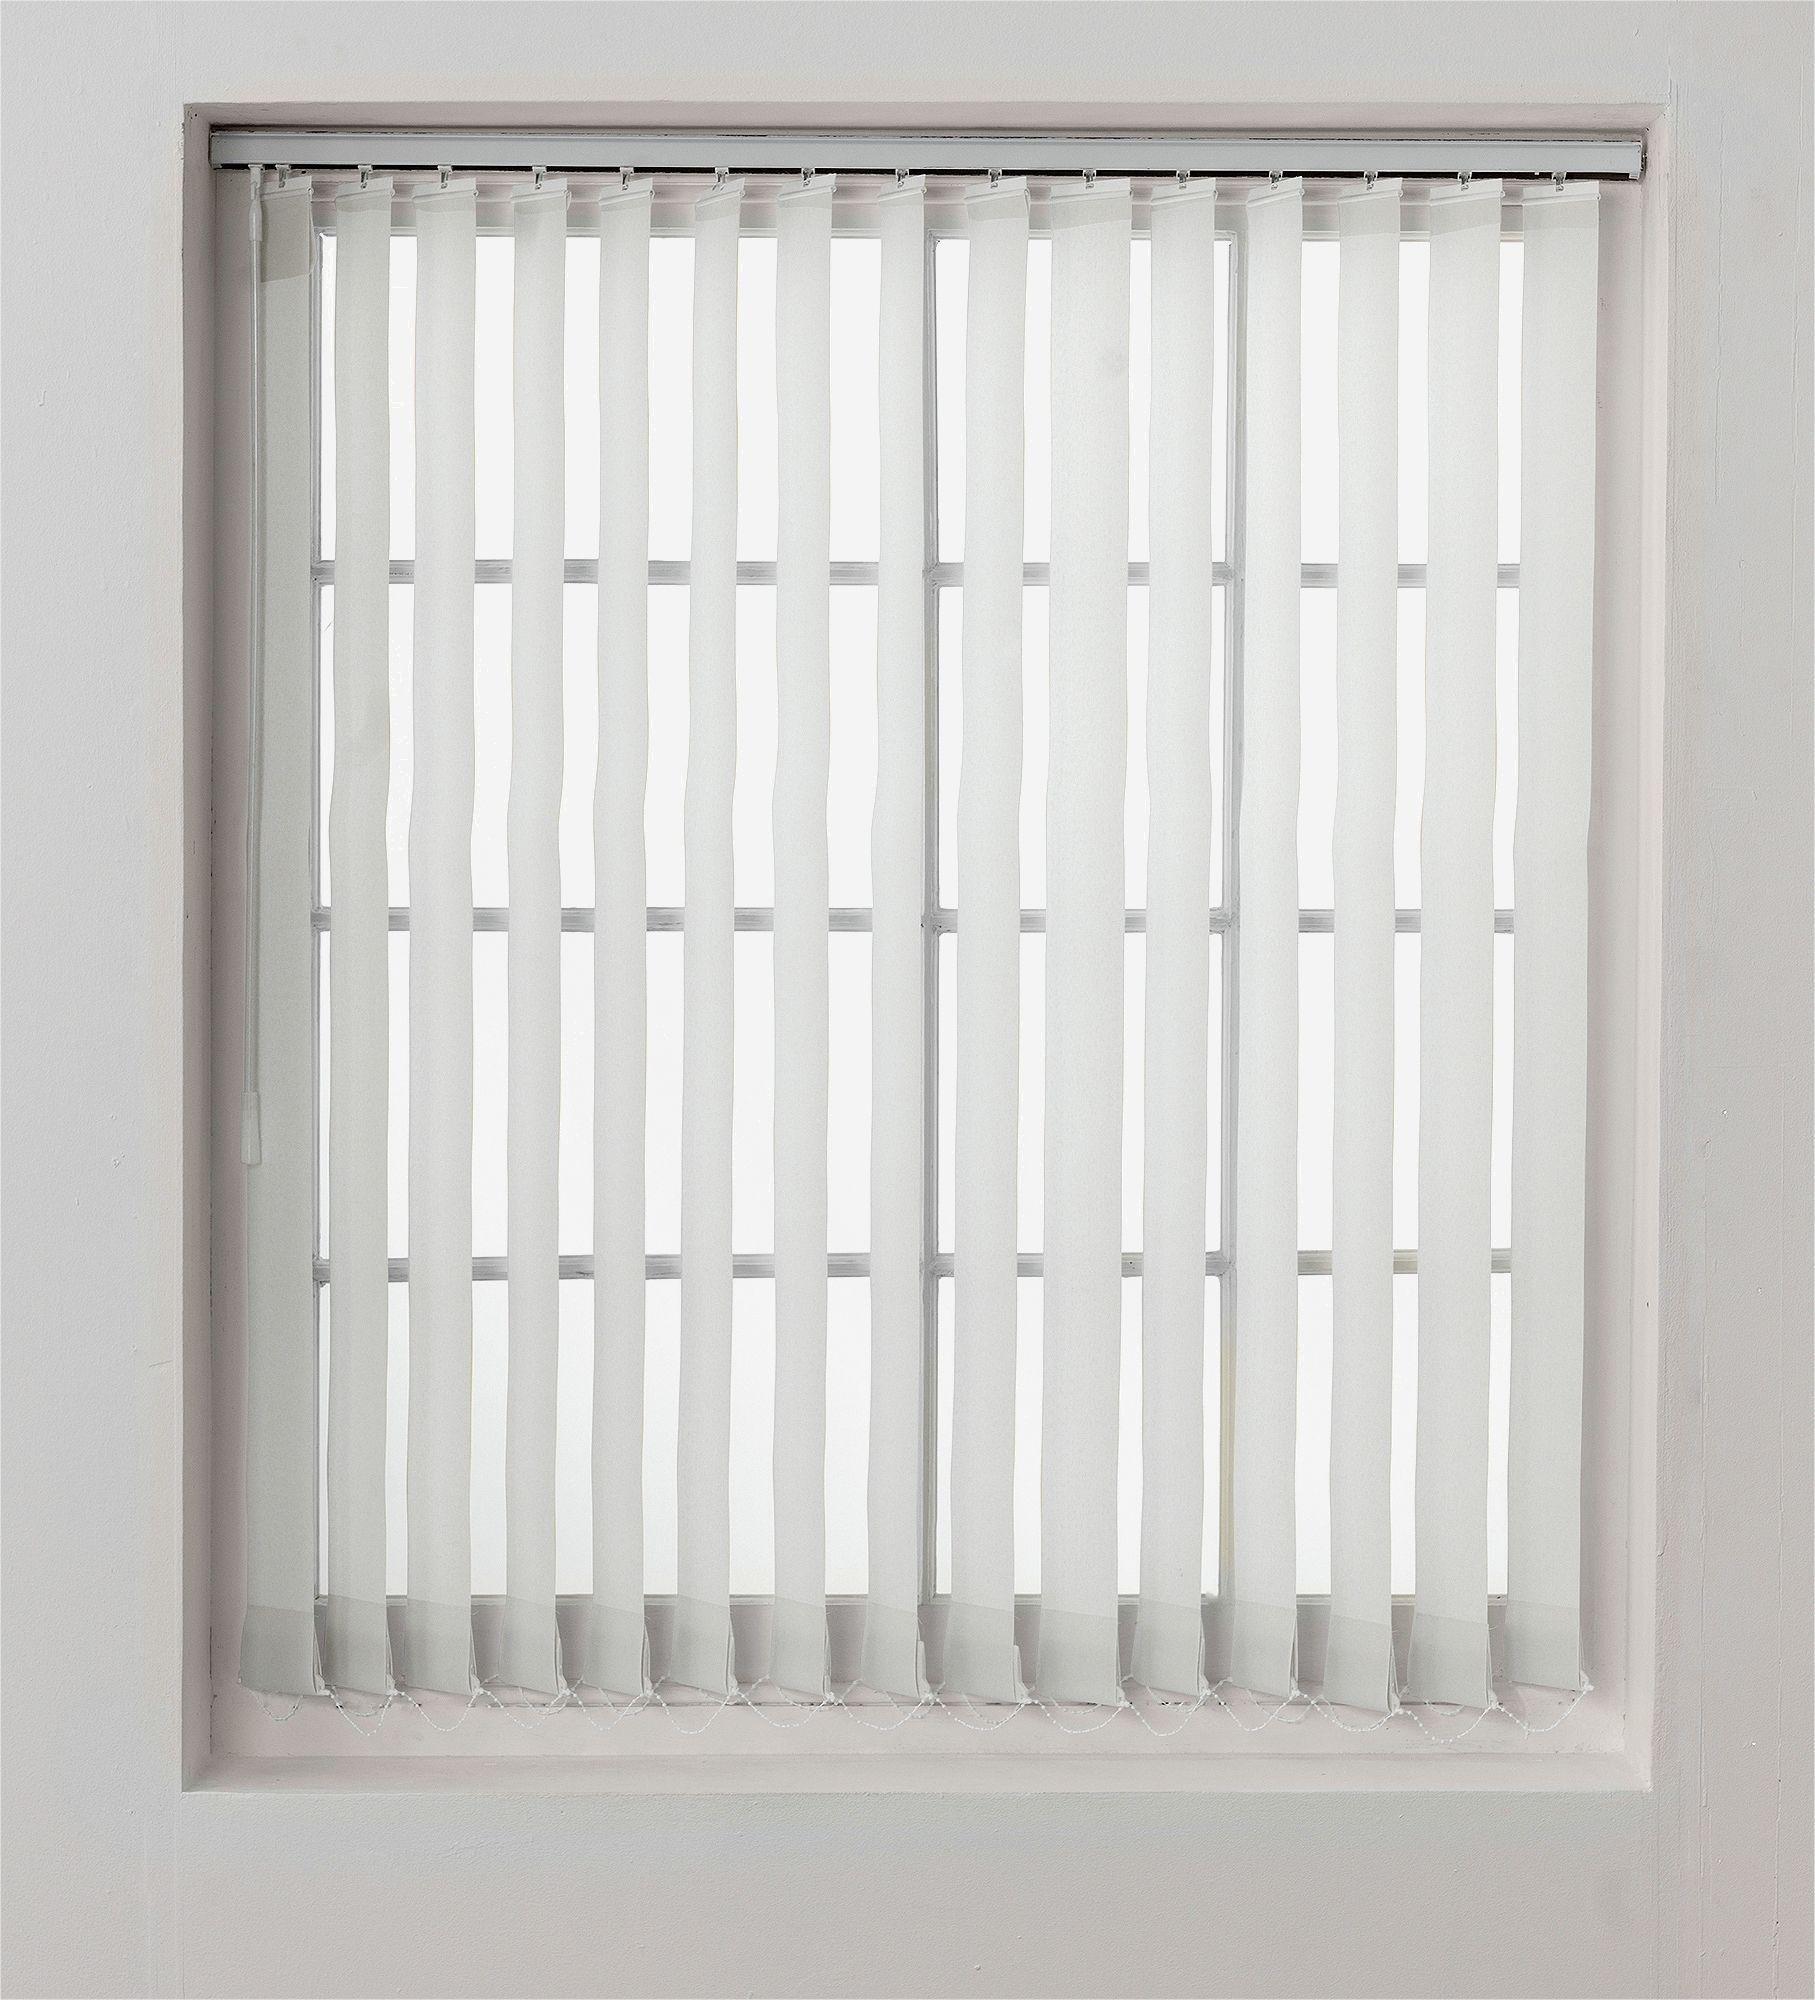 Vertical Blinds buy home vertical blind slats pack - 4.5ft - white at argos.co.uk